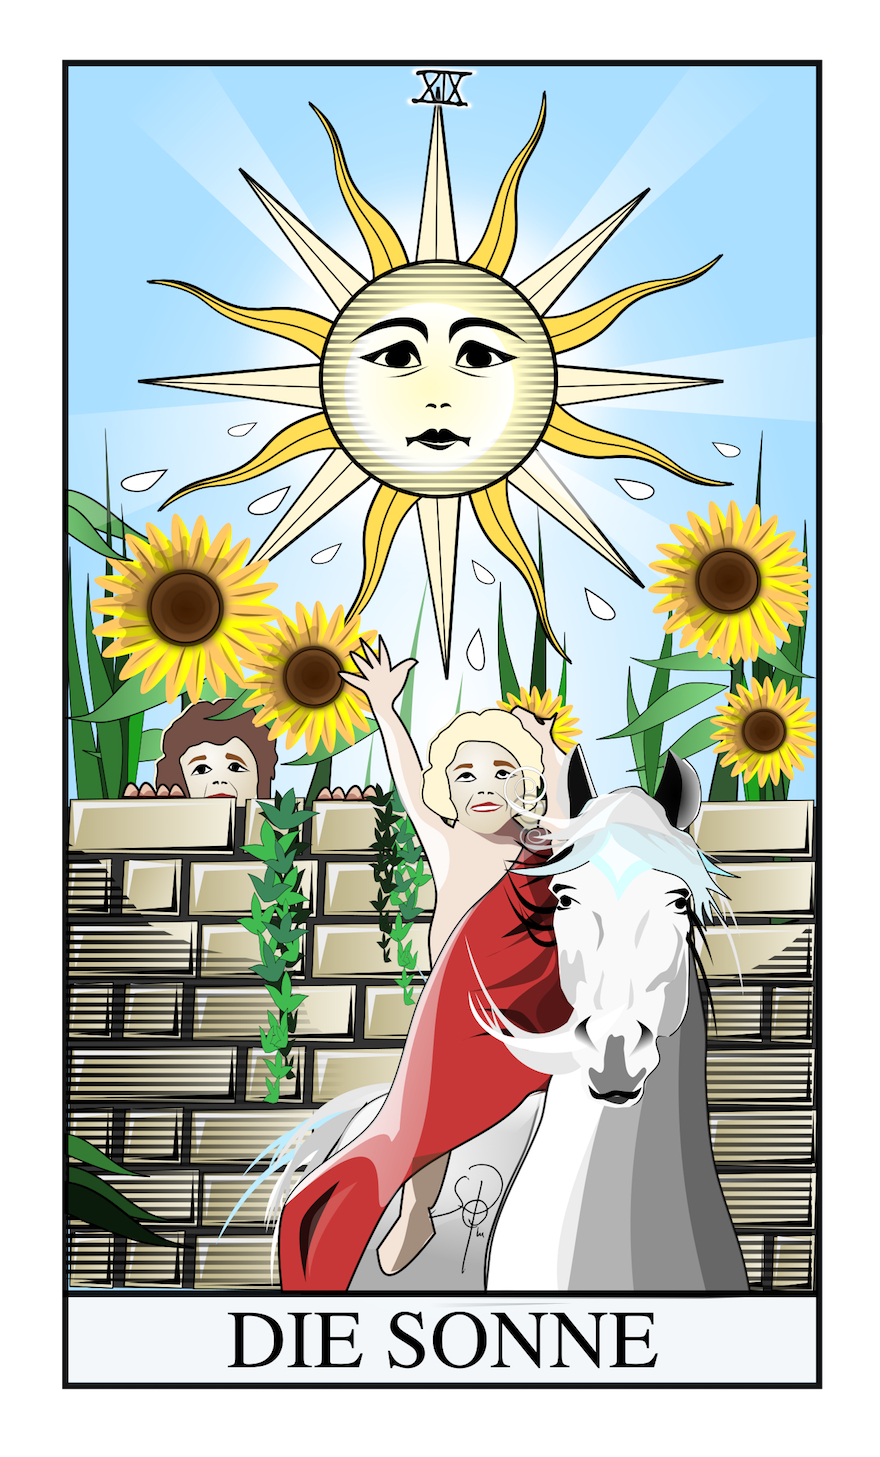 Tarotkarte Sonne